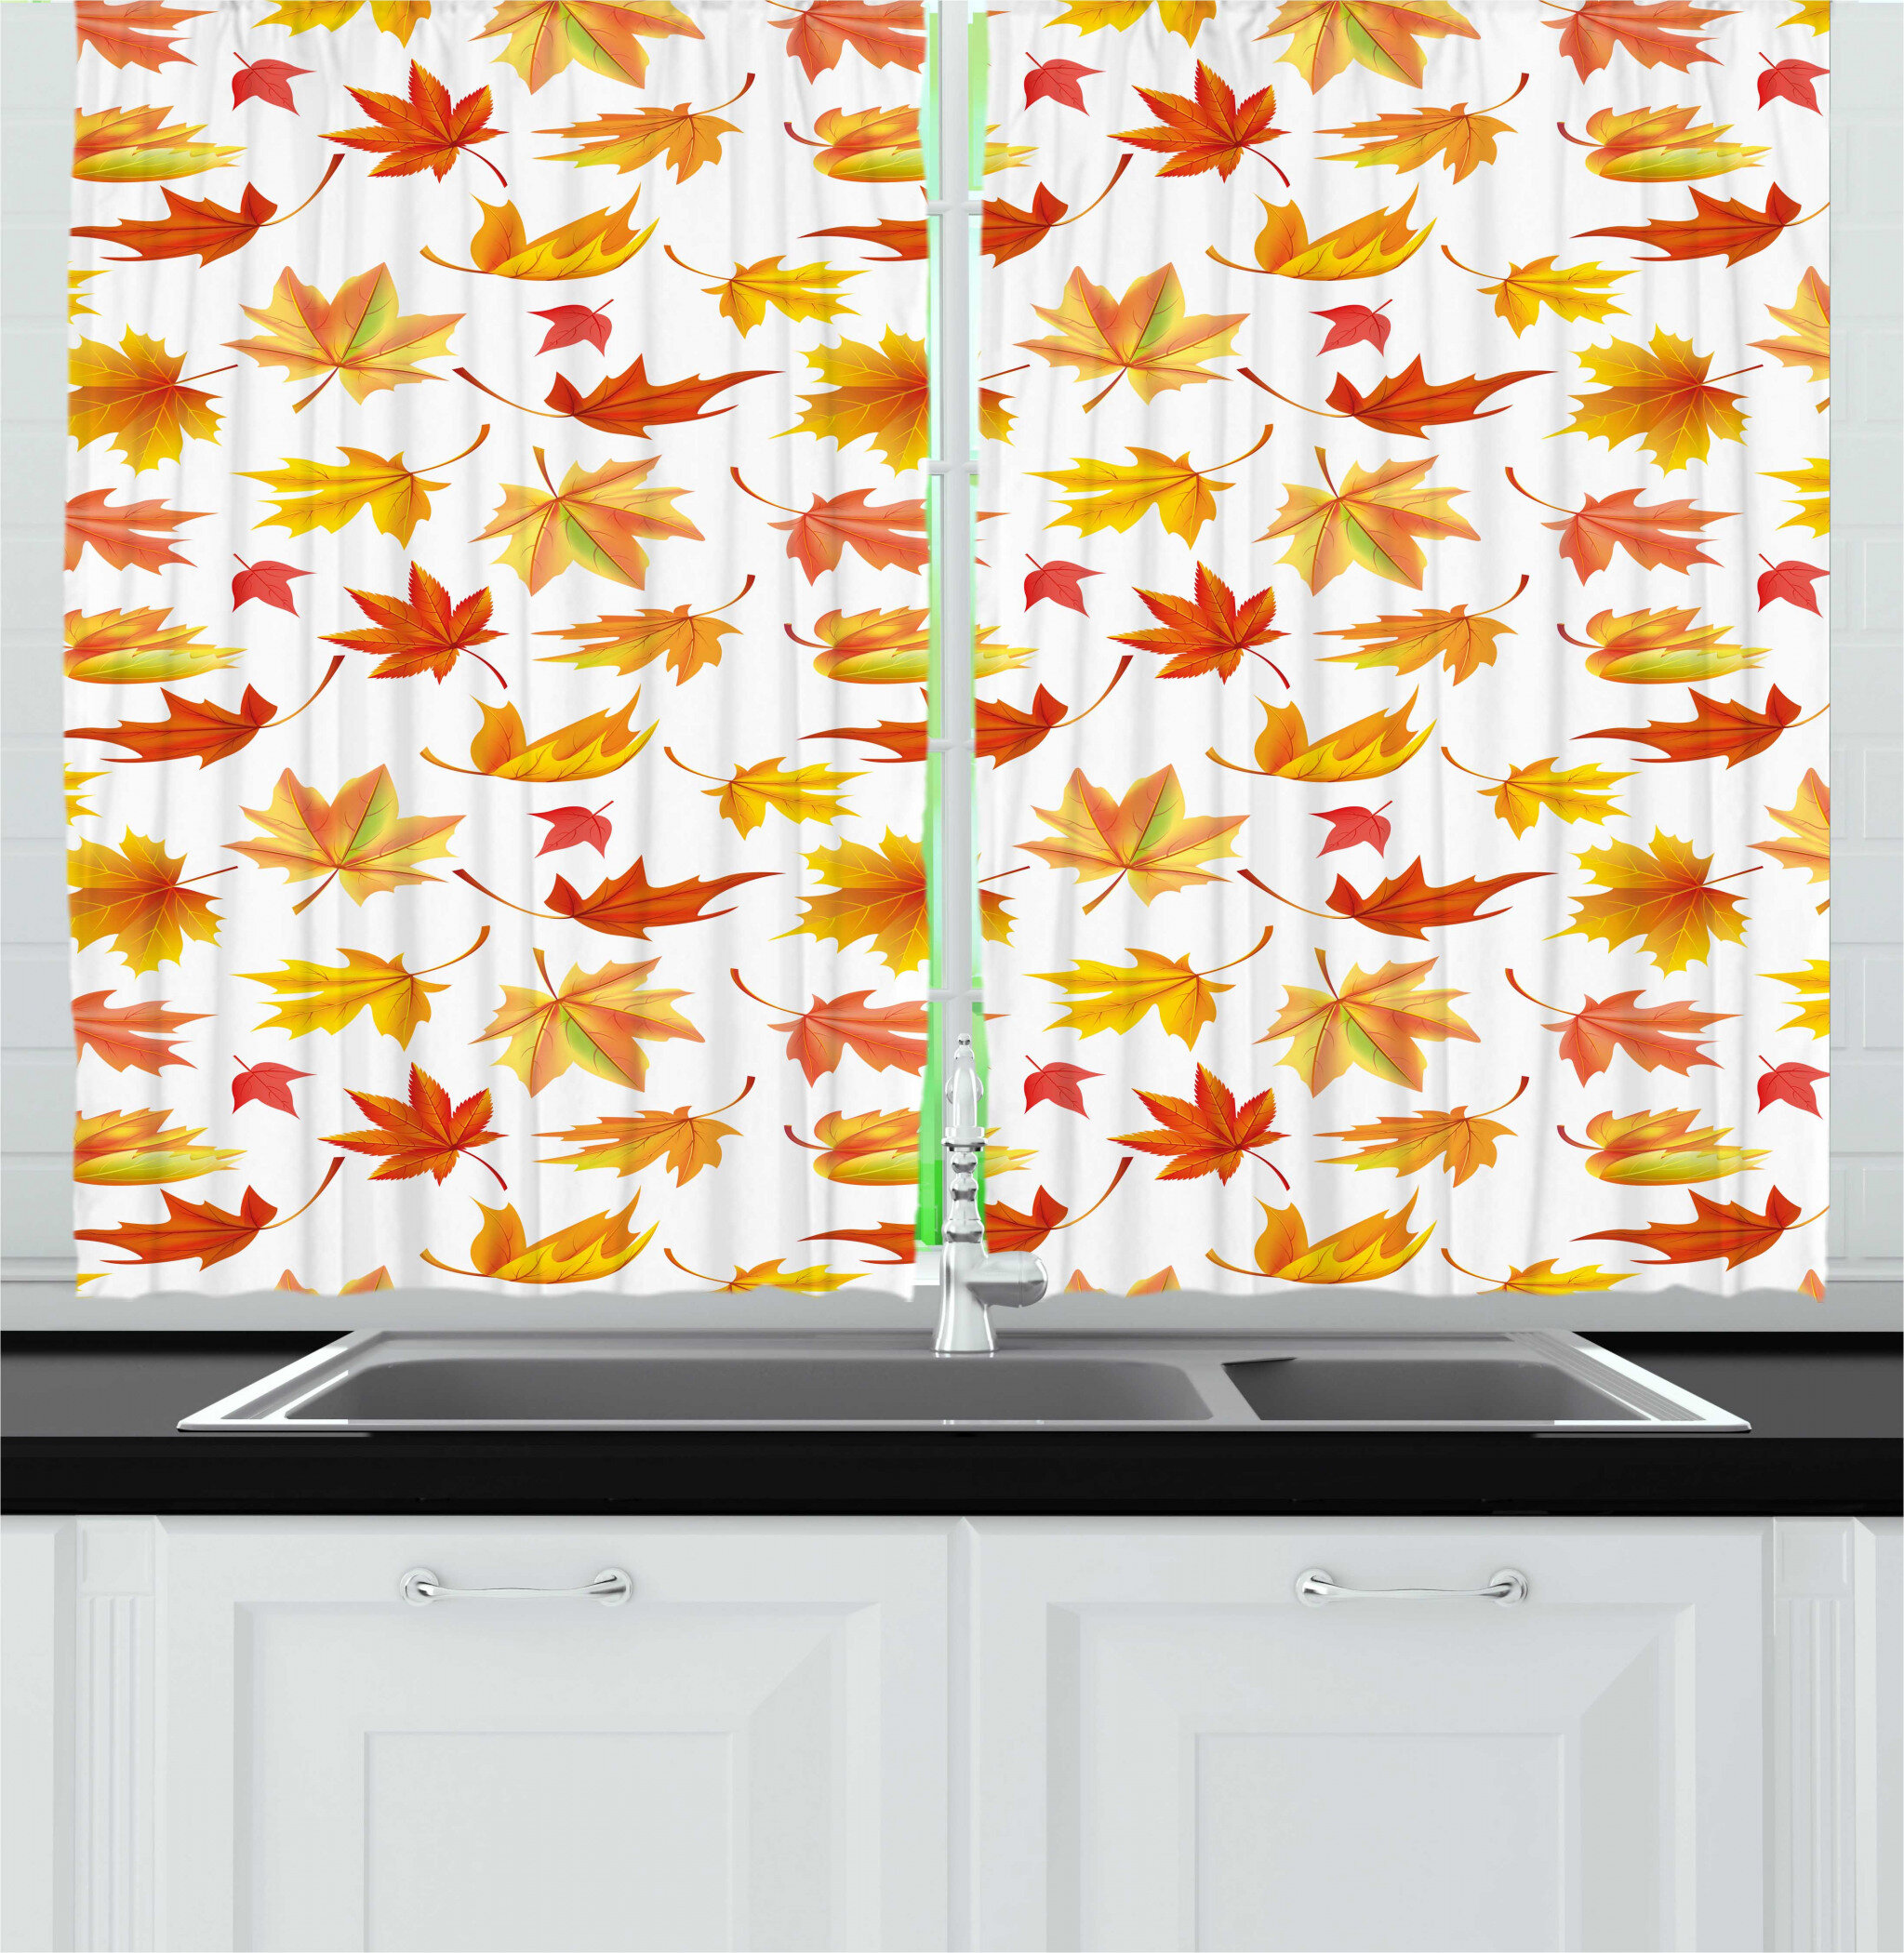 East Urban Home Autumn Demonstration Of Fallen Maple Leaves On A Plain Background Fall Season Kitchen Curtain Wayfair